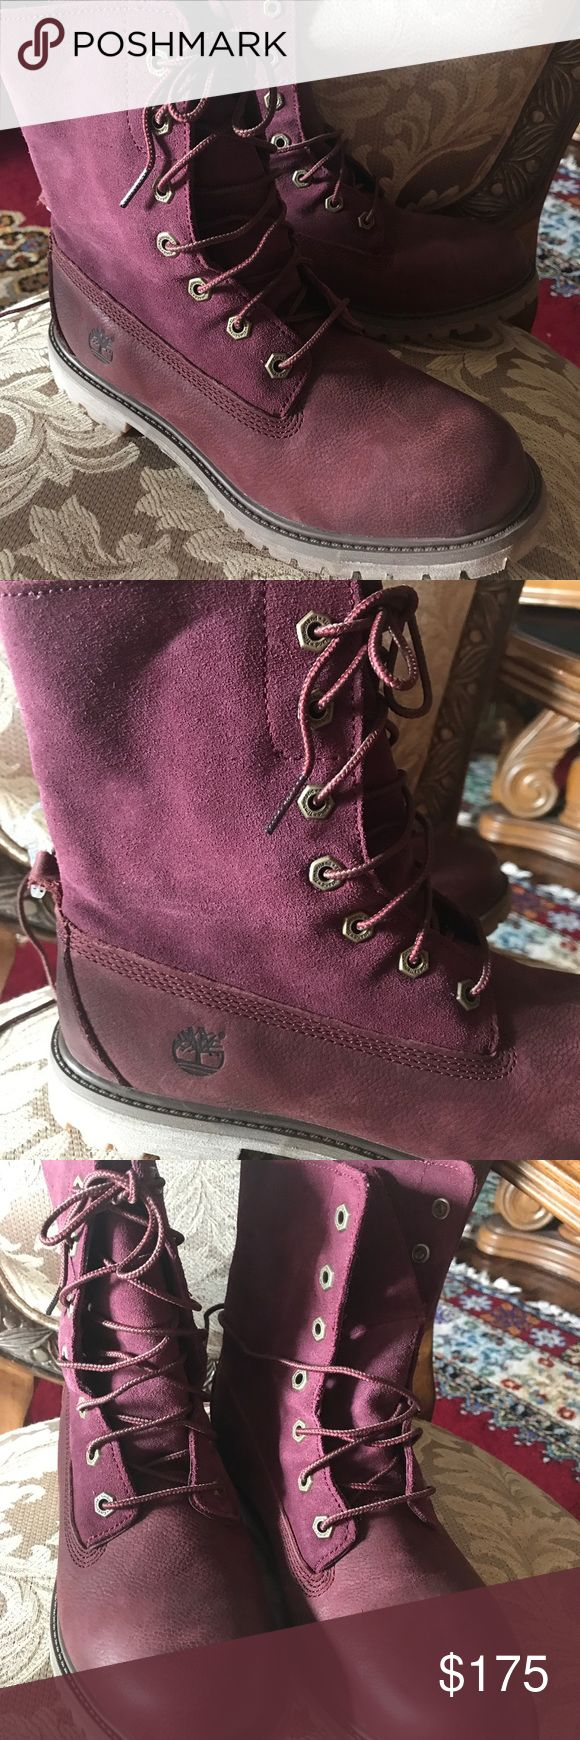 Selling this New Timberland maroon boots size 8.5 on Poshmark! My username is: shoppiiiiing. #shopmycloset #poshmark #fashion #shopping #style #forsale #Timberland #Shoes